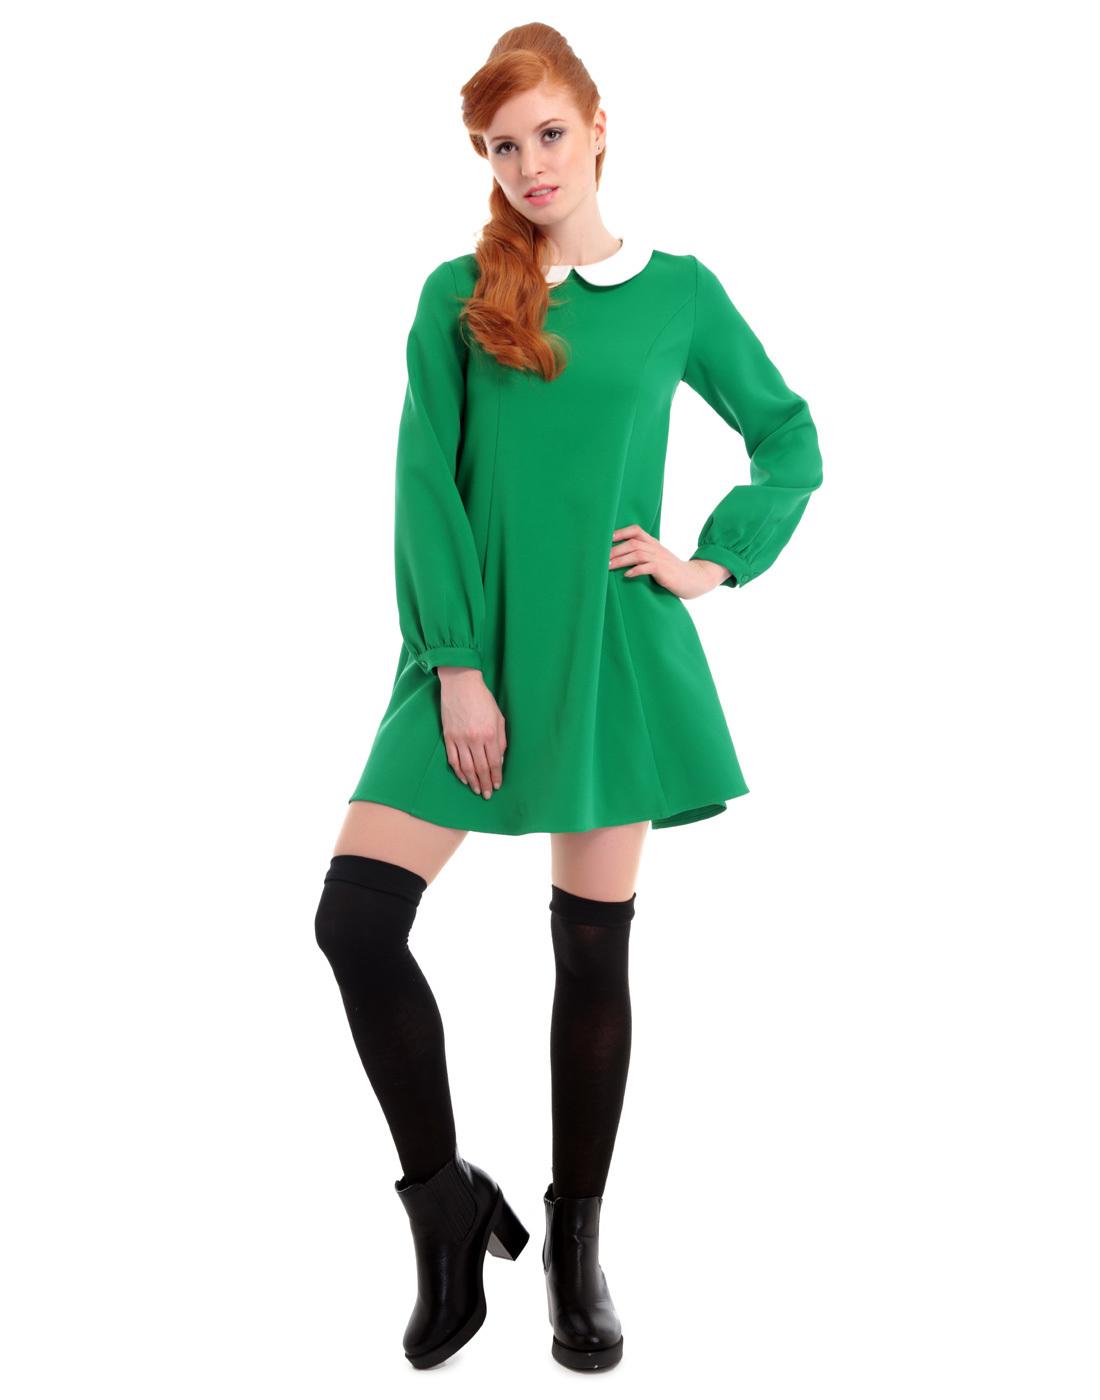 Nia BRIGHT & BEAUTIFUL 1960s Mod Long Sleeve Dress